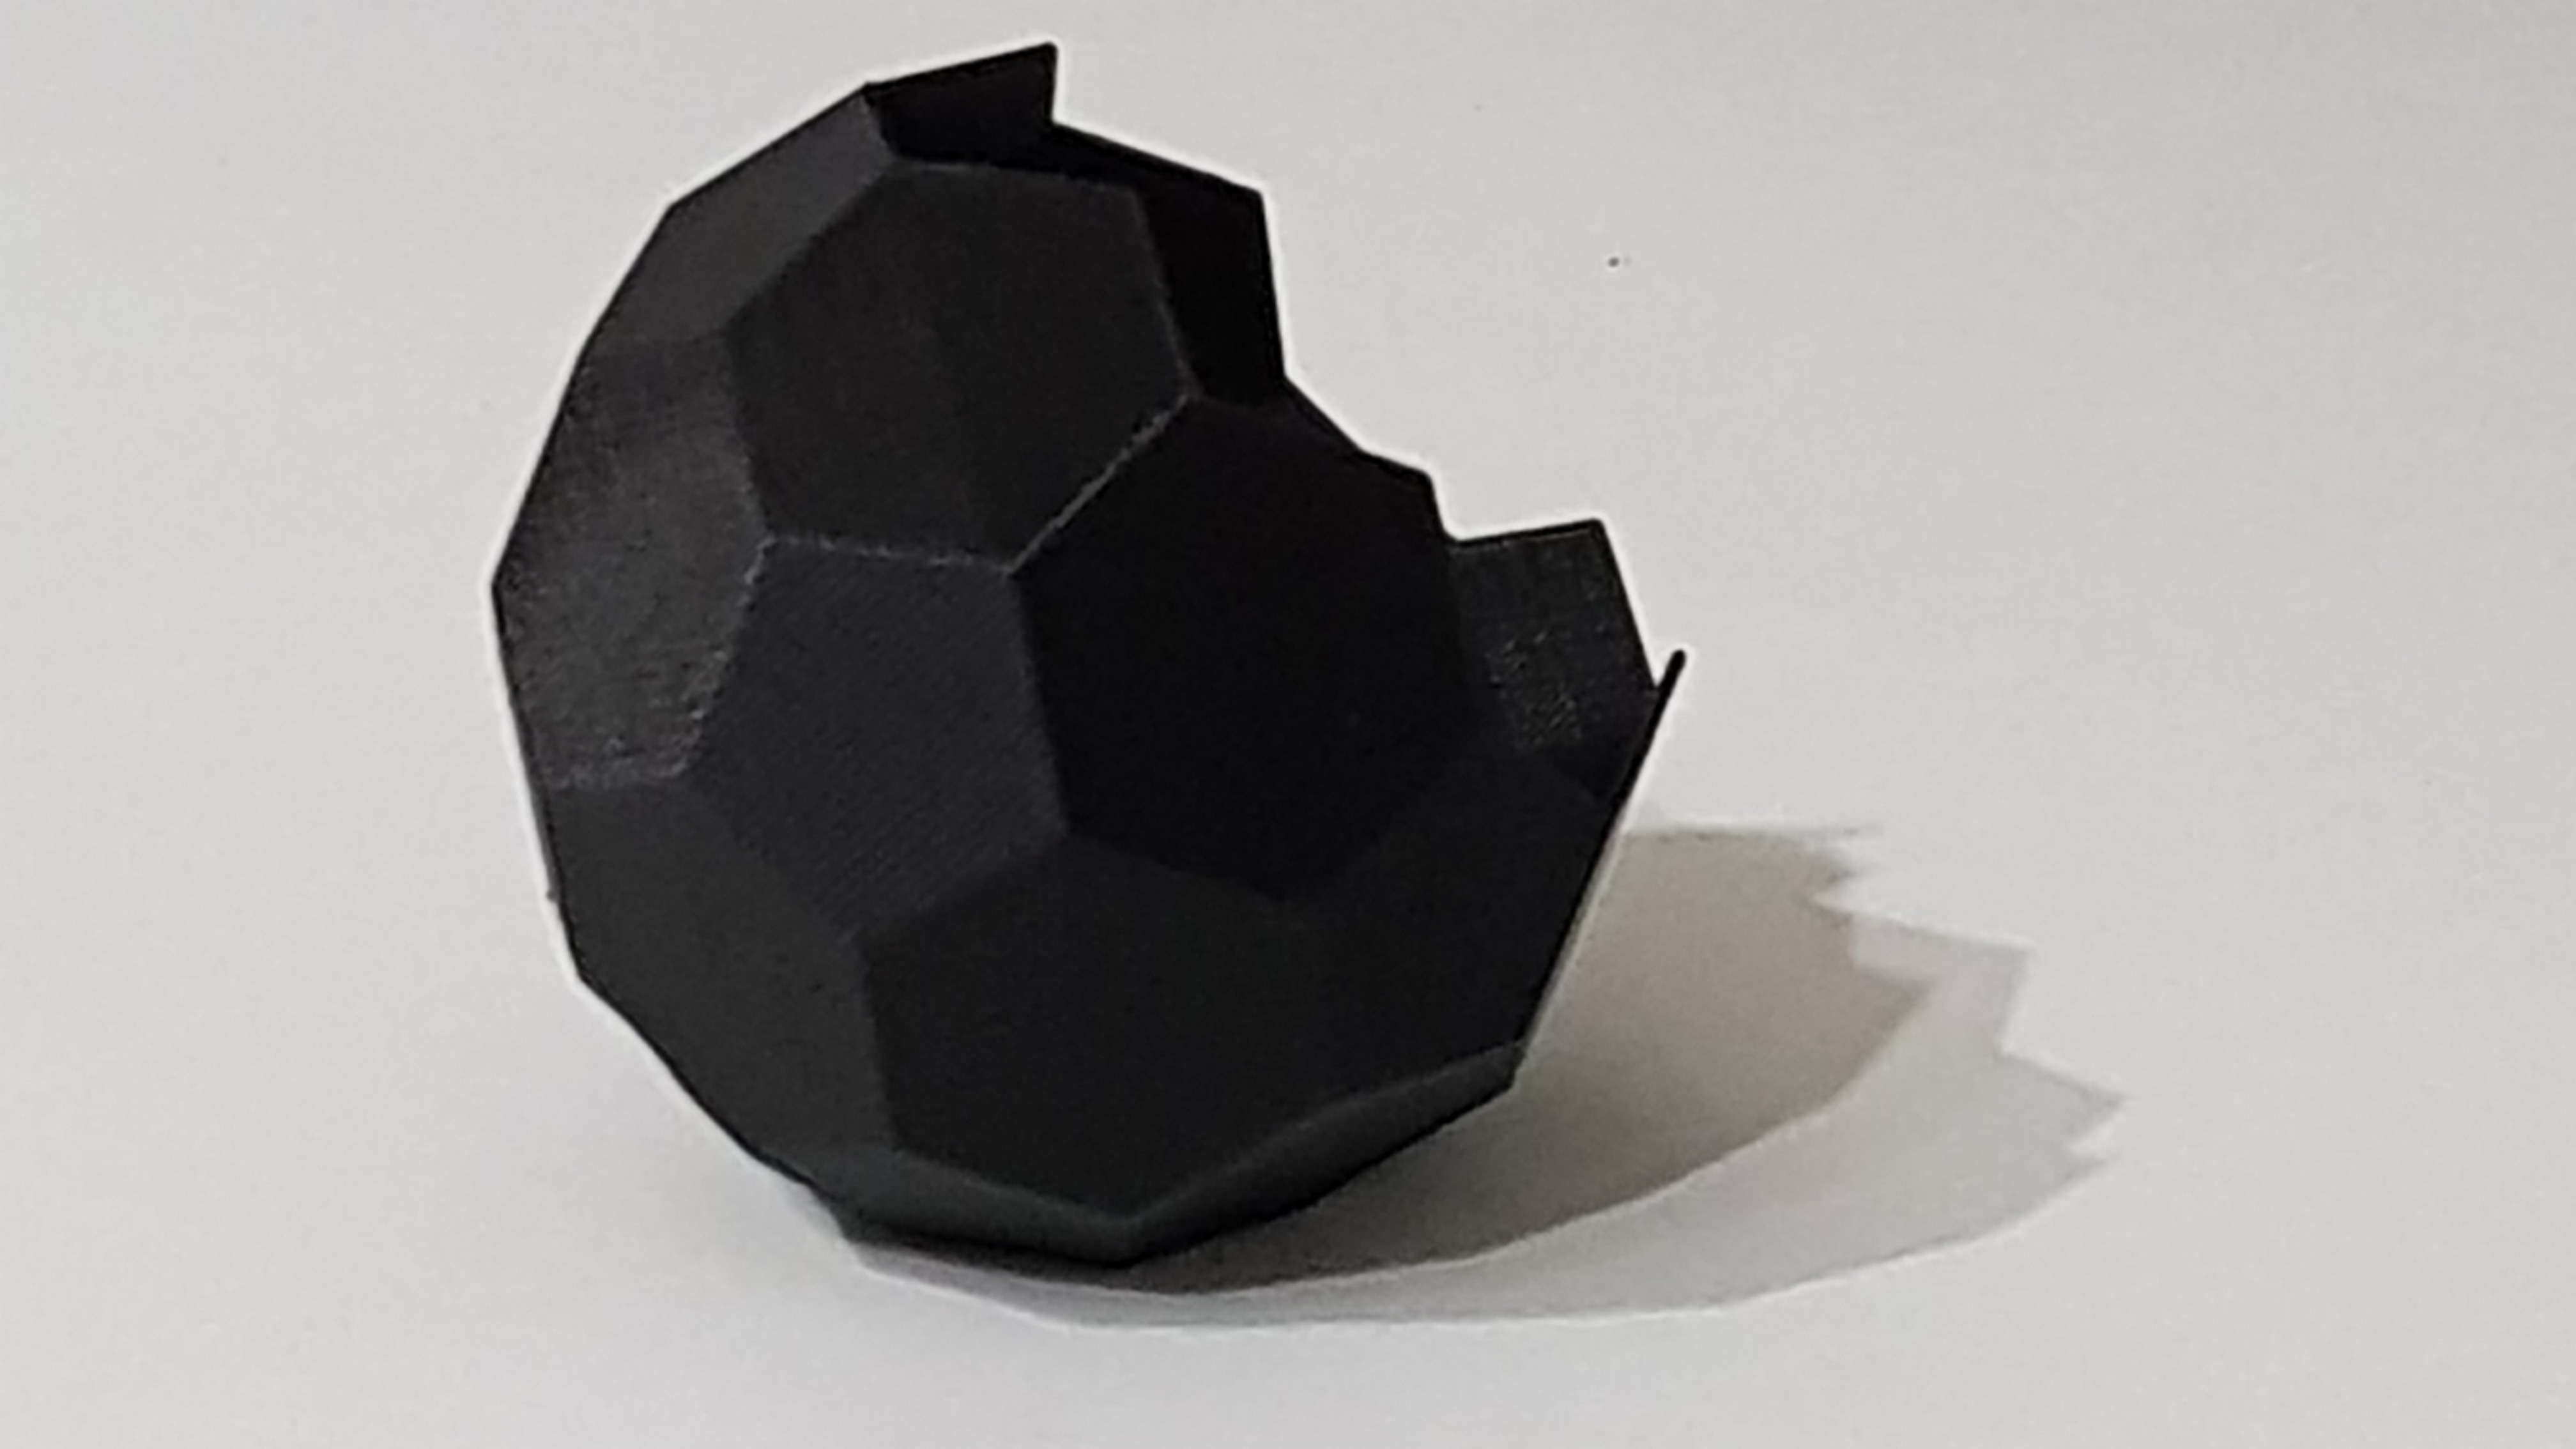 20180208_194153.jpg Download free STL file Mini planter • 3D printing design, solunkejagruti